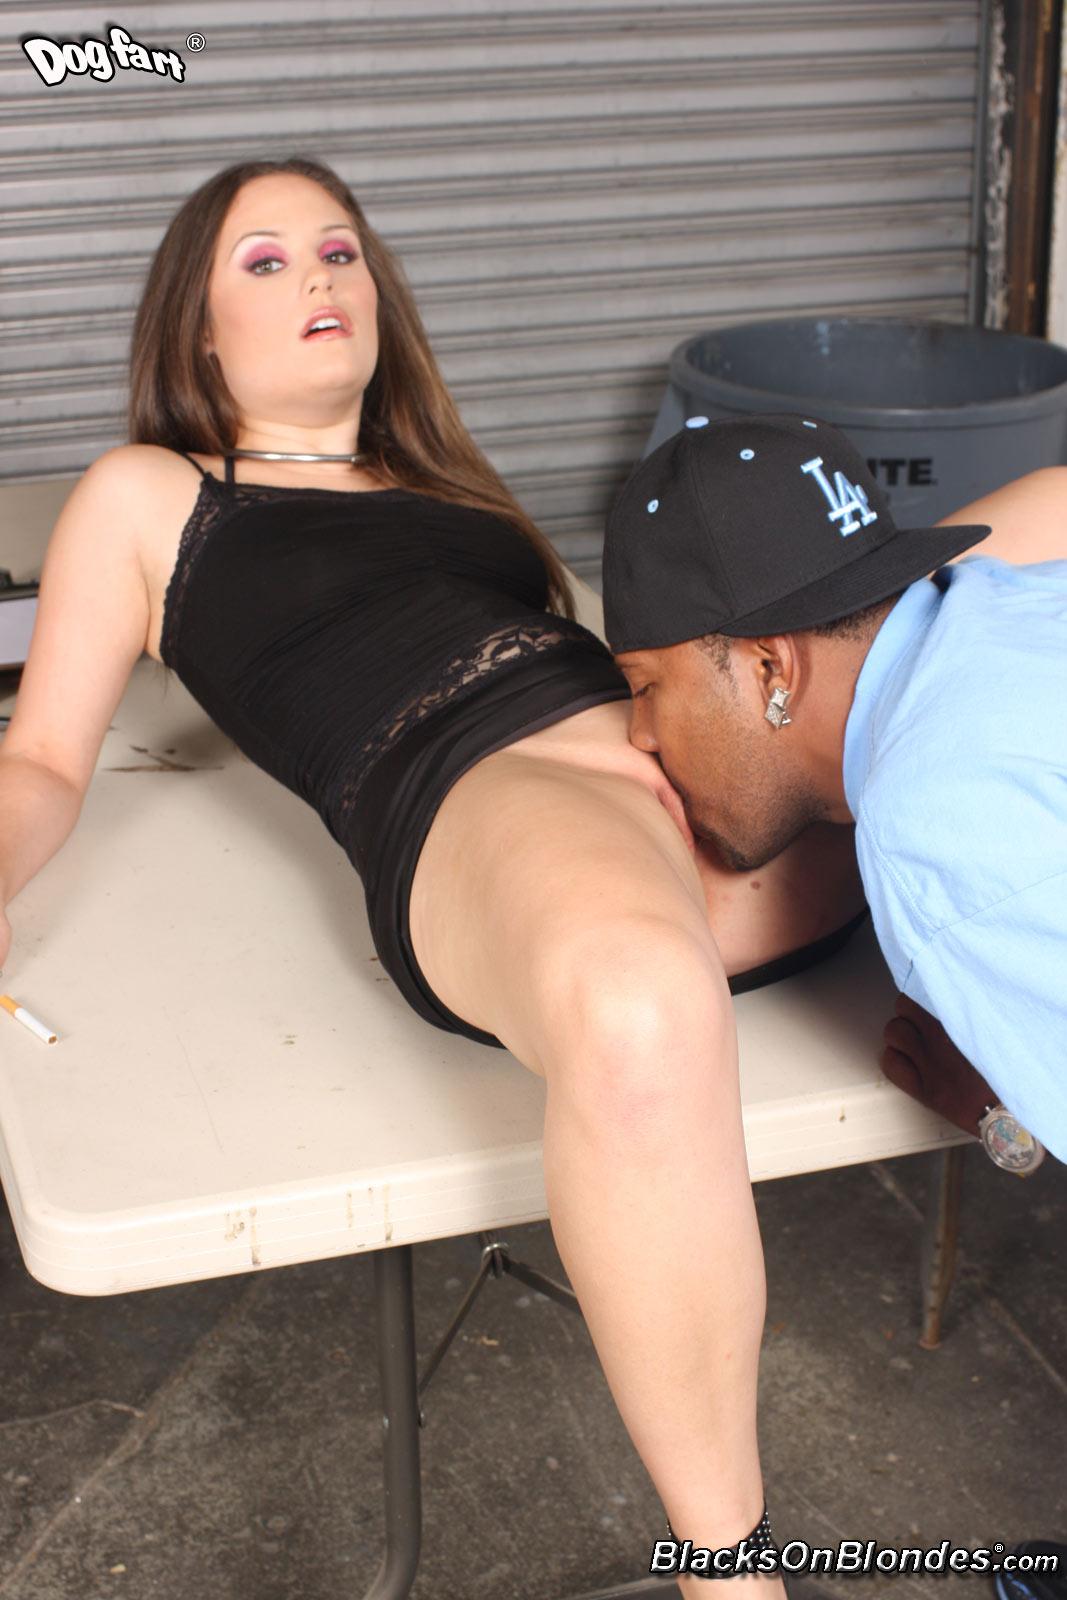 Порно актриса шарлотта вале